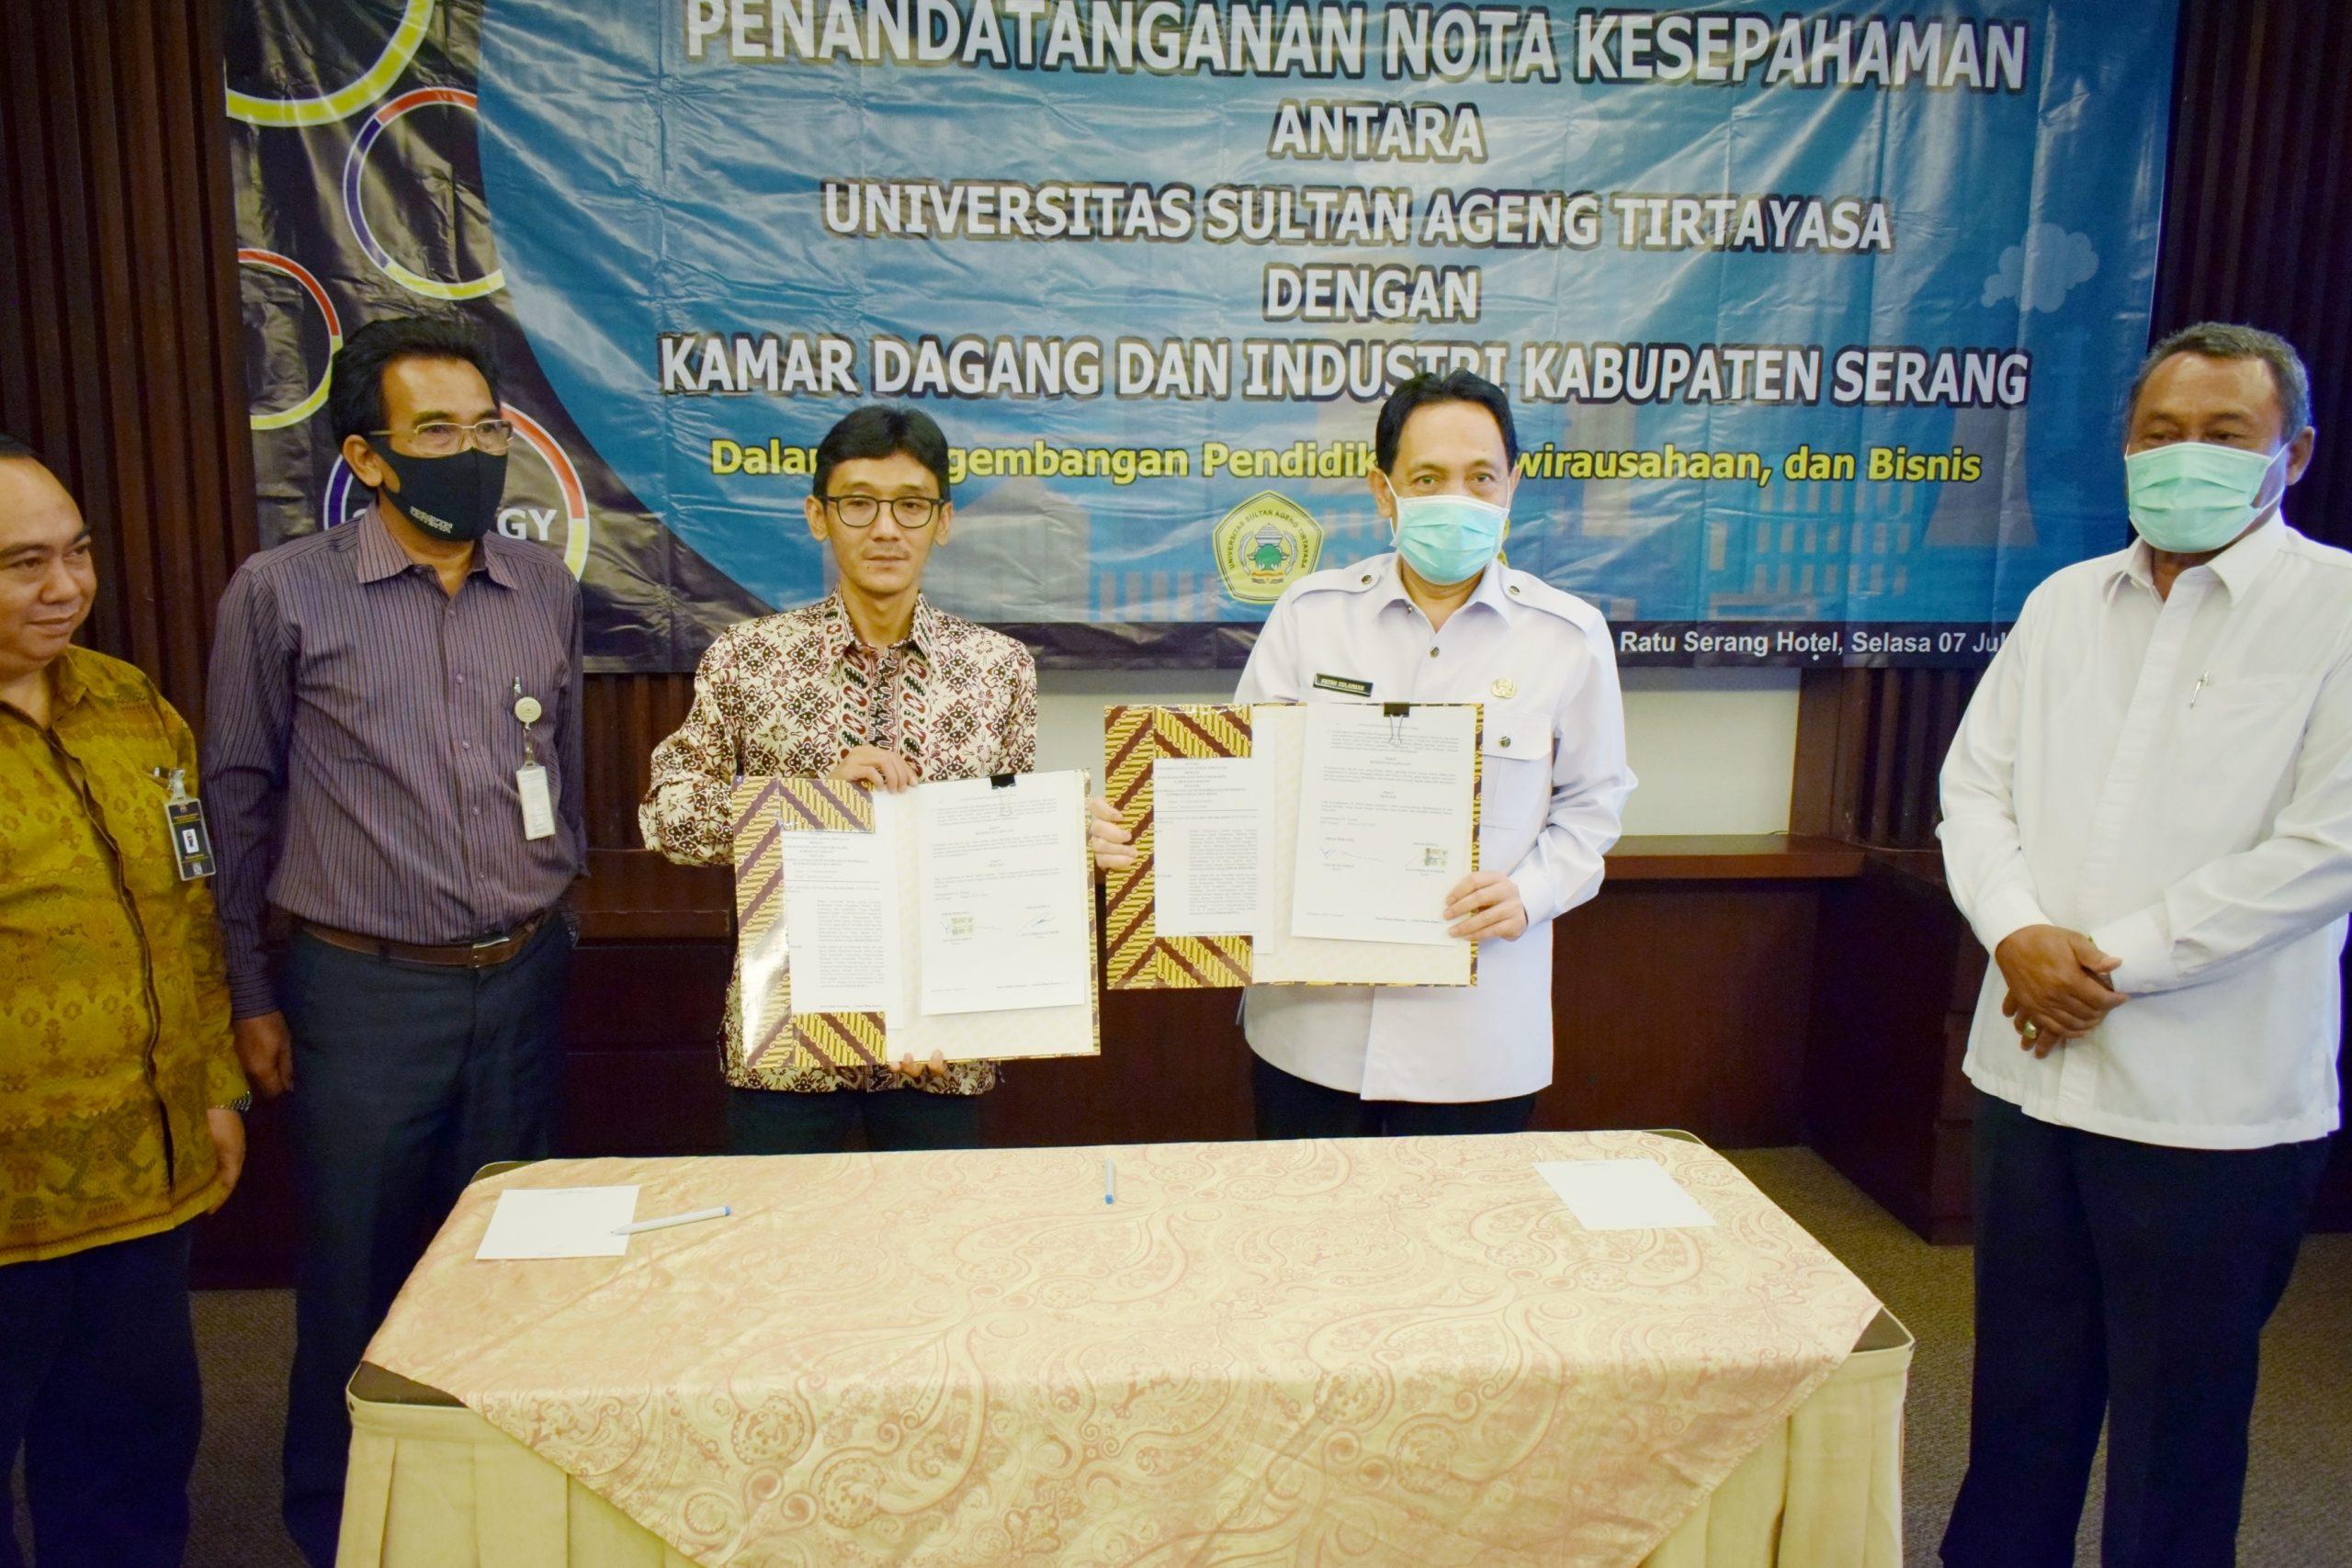 Untirta MoU Dengan Kamar Dagang Dan Industri (KADIN) Kabupaten Serang Untuk Mewujudkan Program Kampus Merdeka